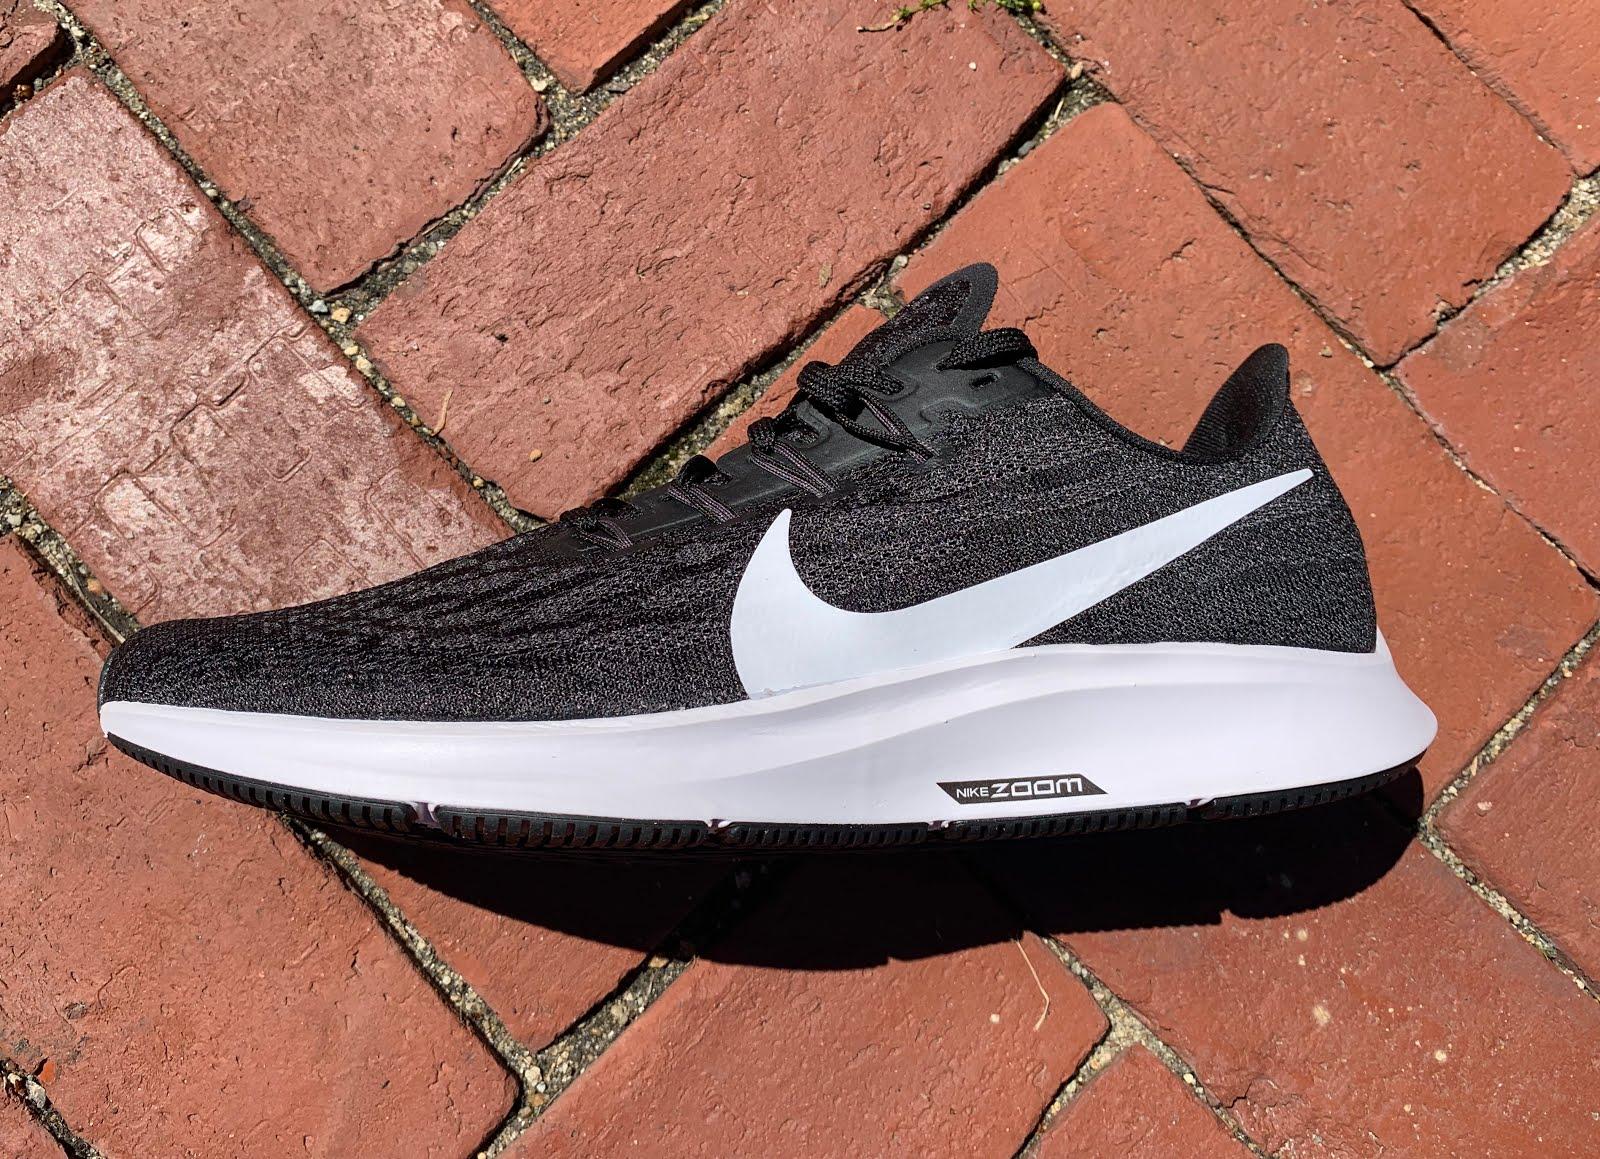 outlet store 1c284 1e0e6 Road Trail Run: Nike Zoom Pegasus 36 Initial Runs Video ...